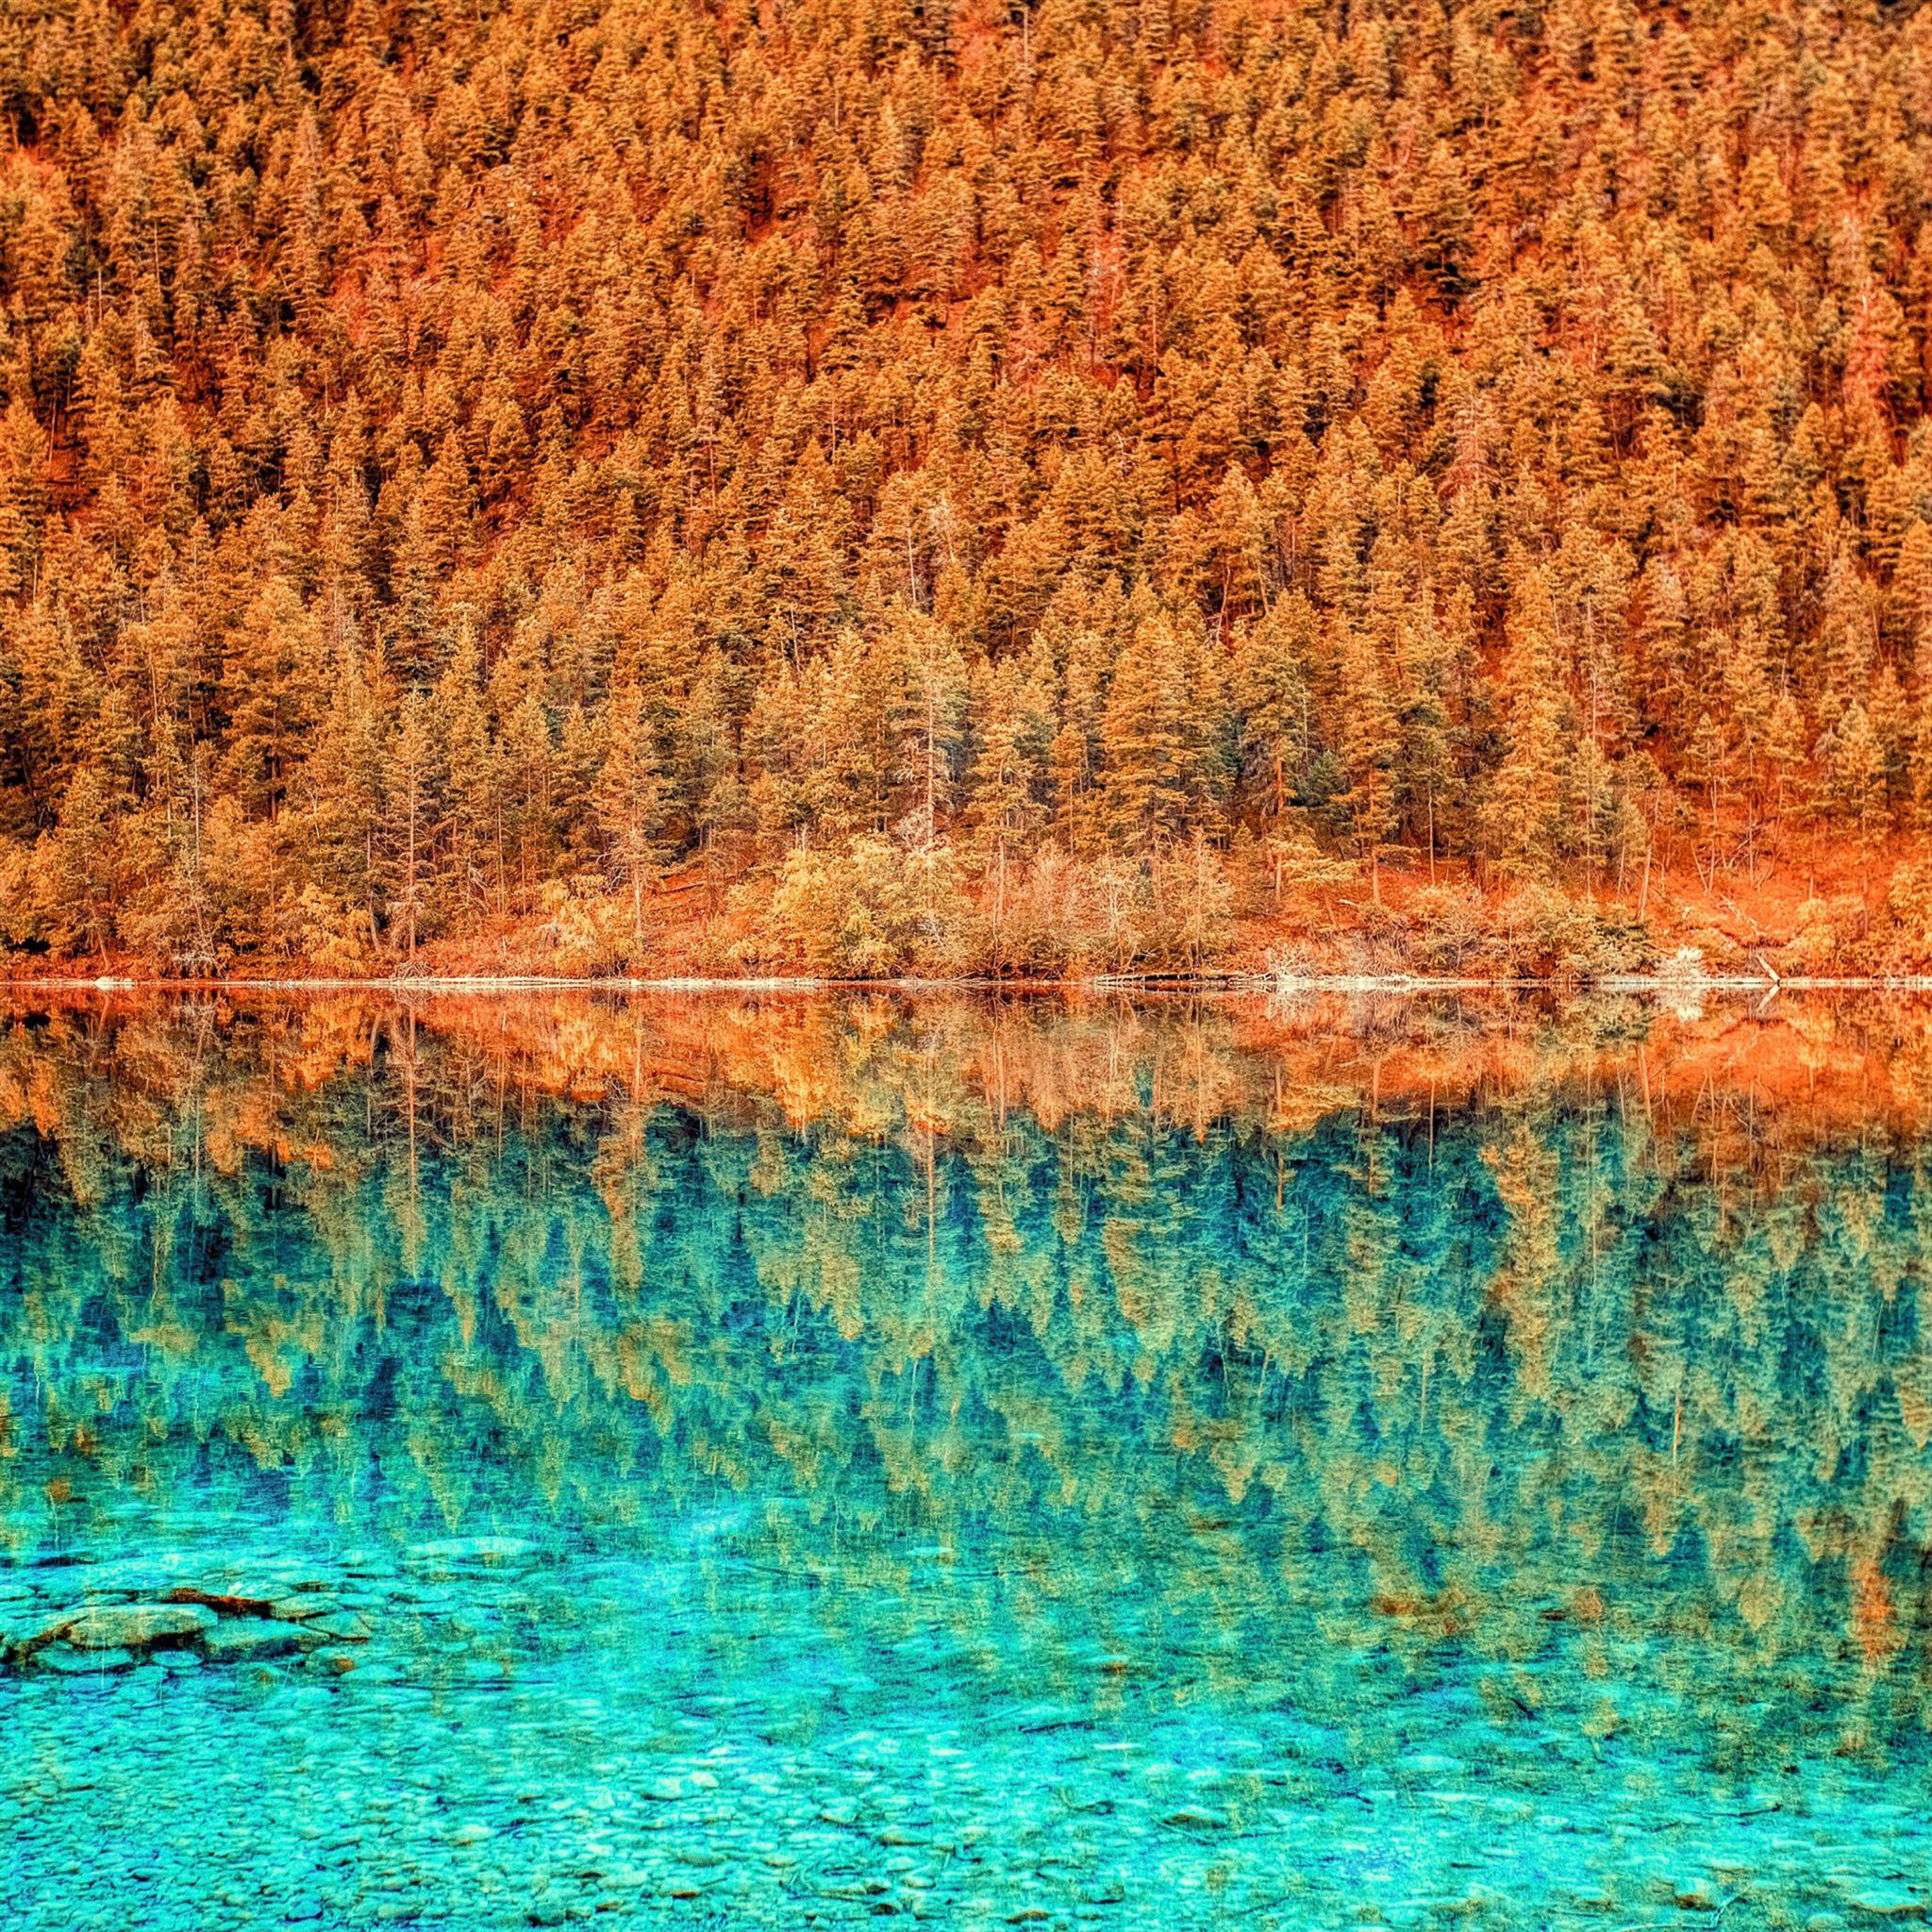 Lake Trees Reflection iPad Pro wallpaper